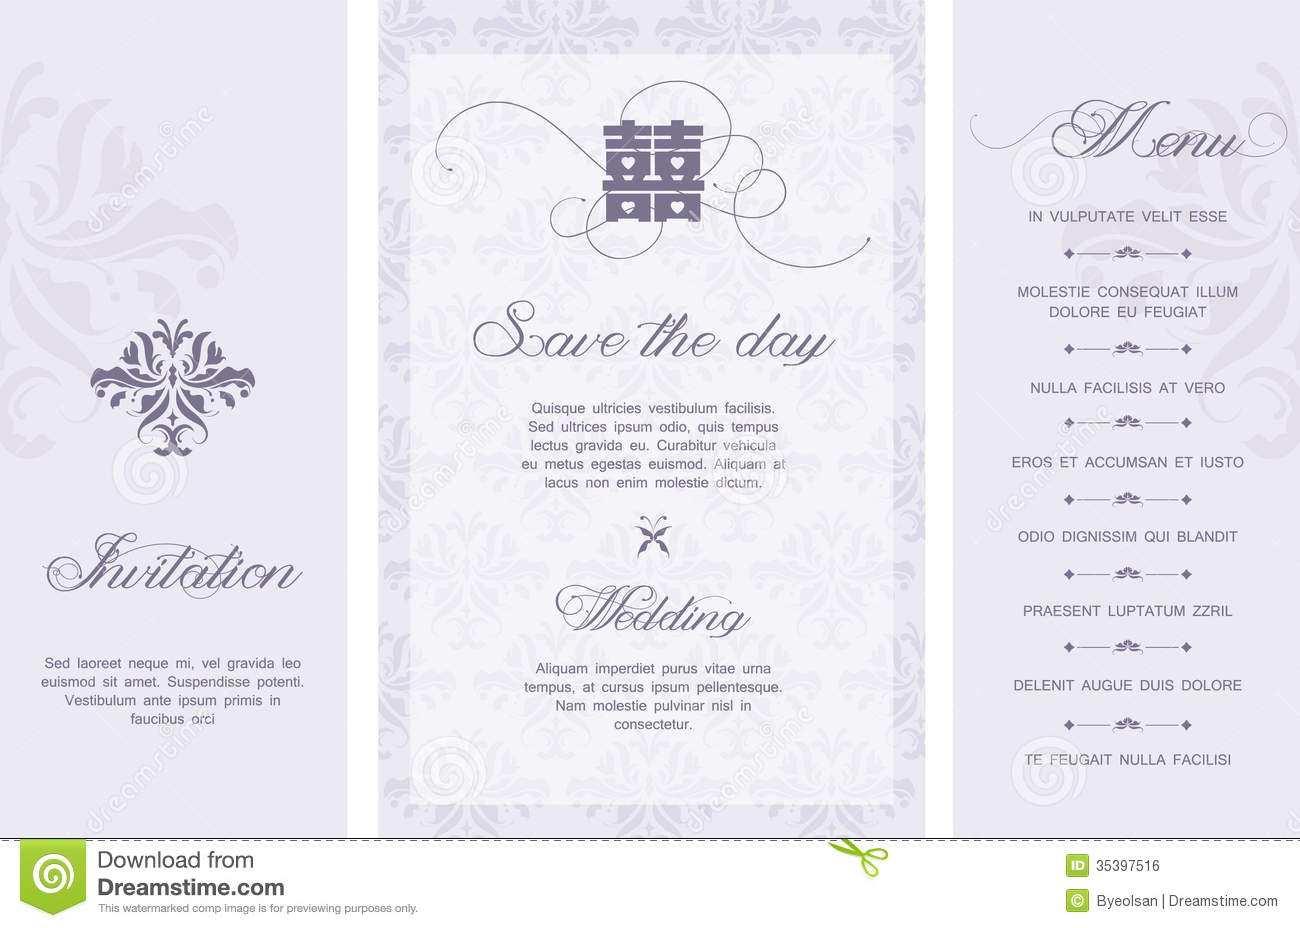 20 Customize Elegant Wedding Invitation Designs Free in Photoshop by Elegant Wedding Invitation Designs Free